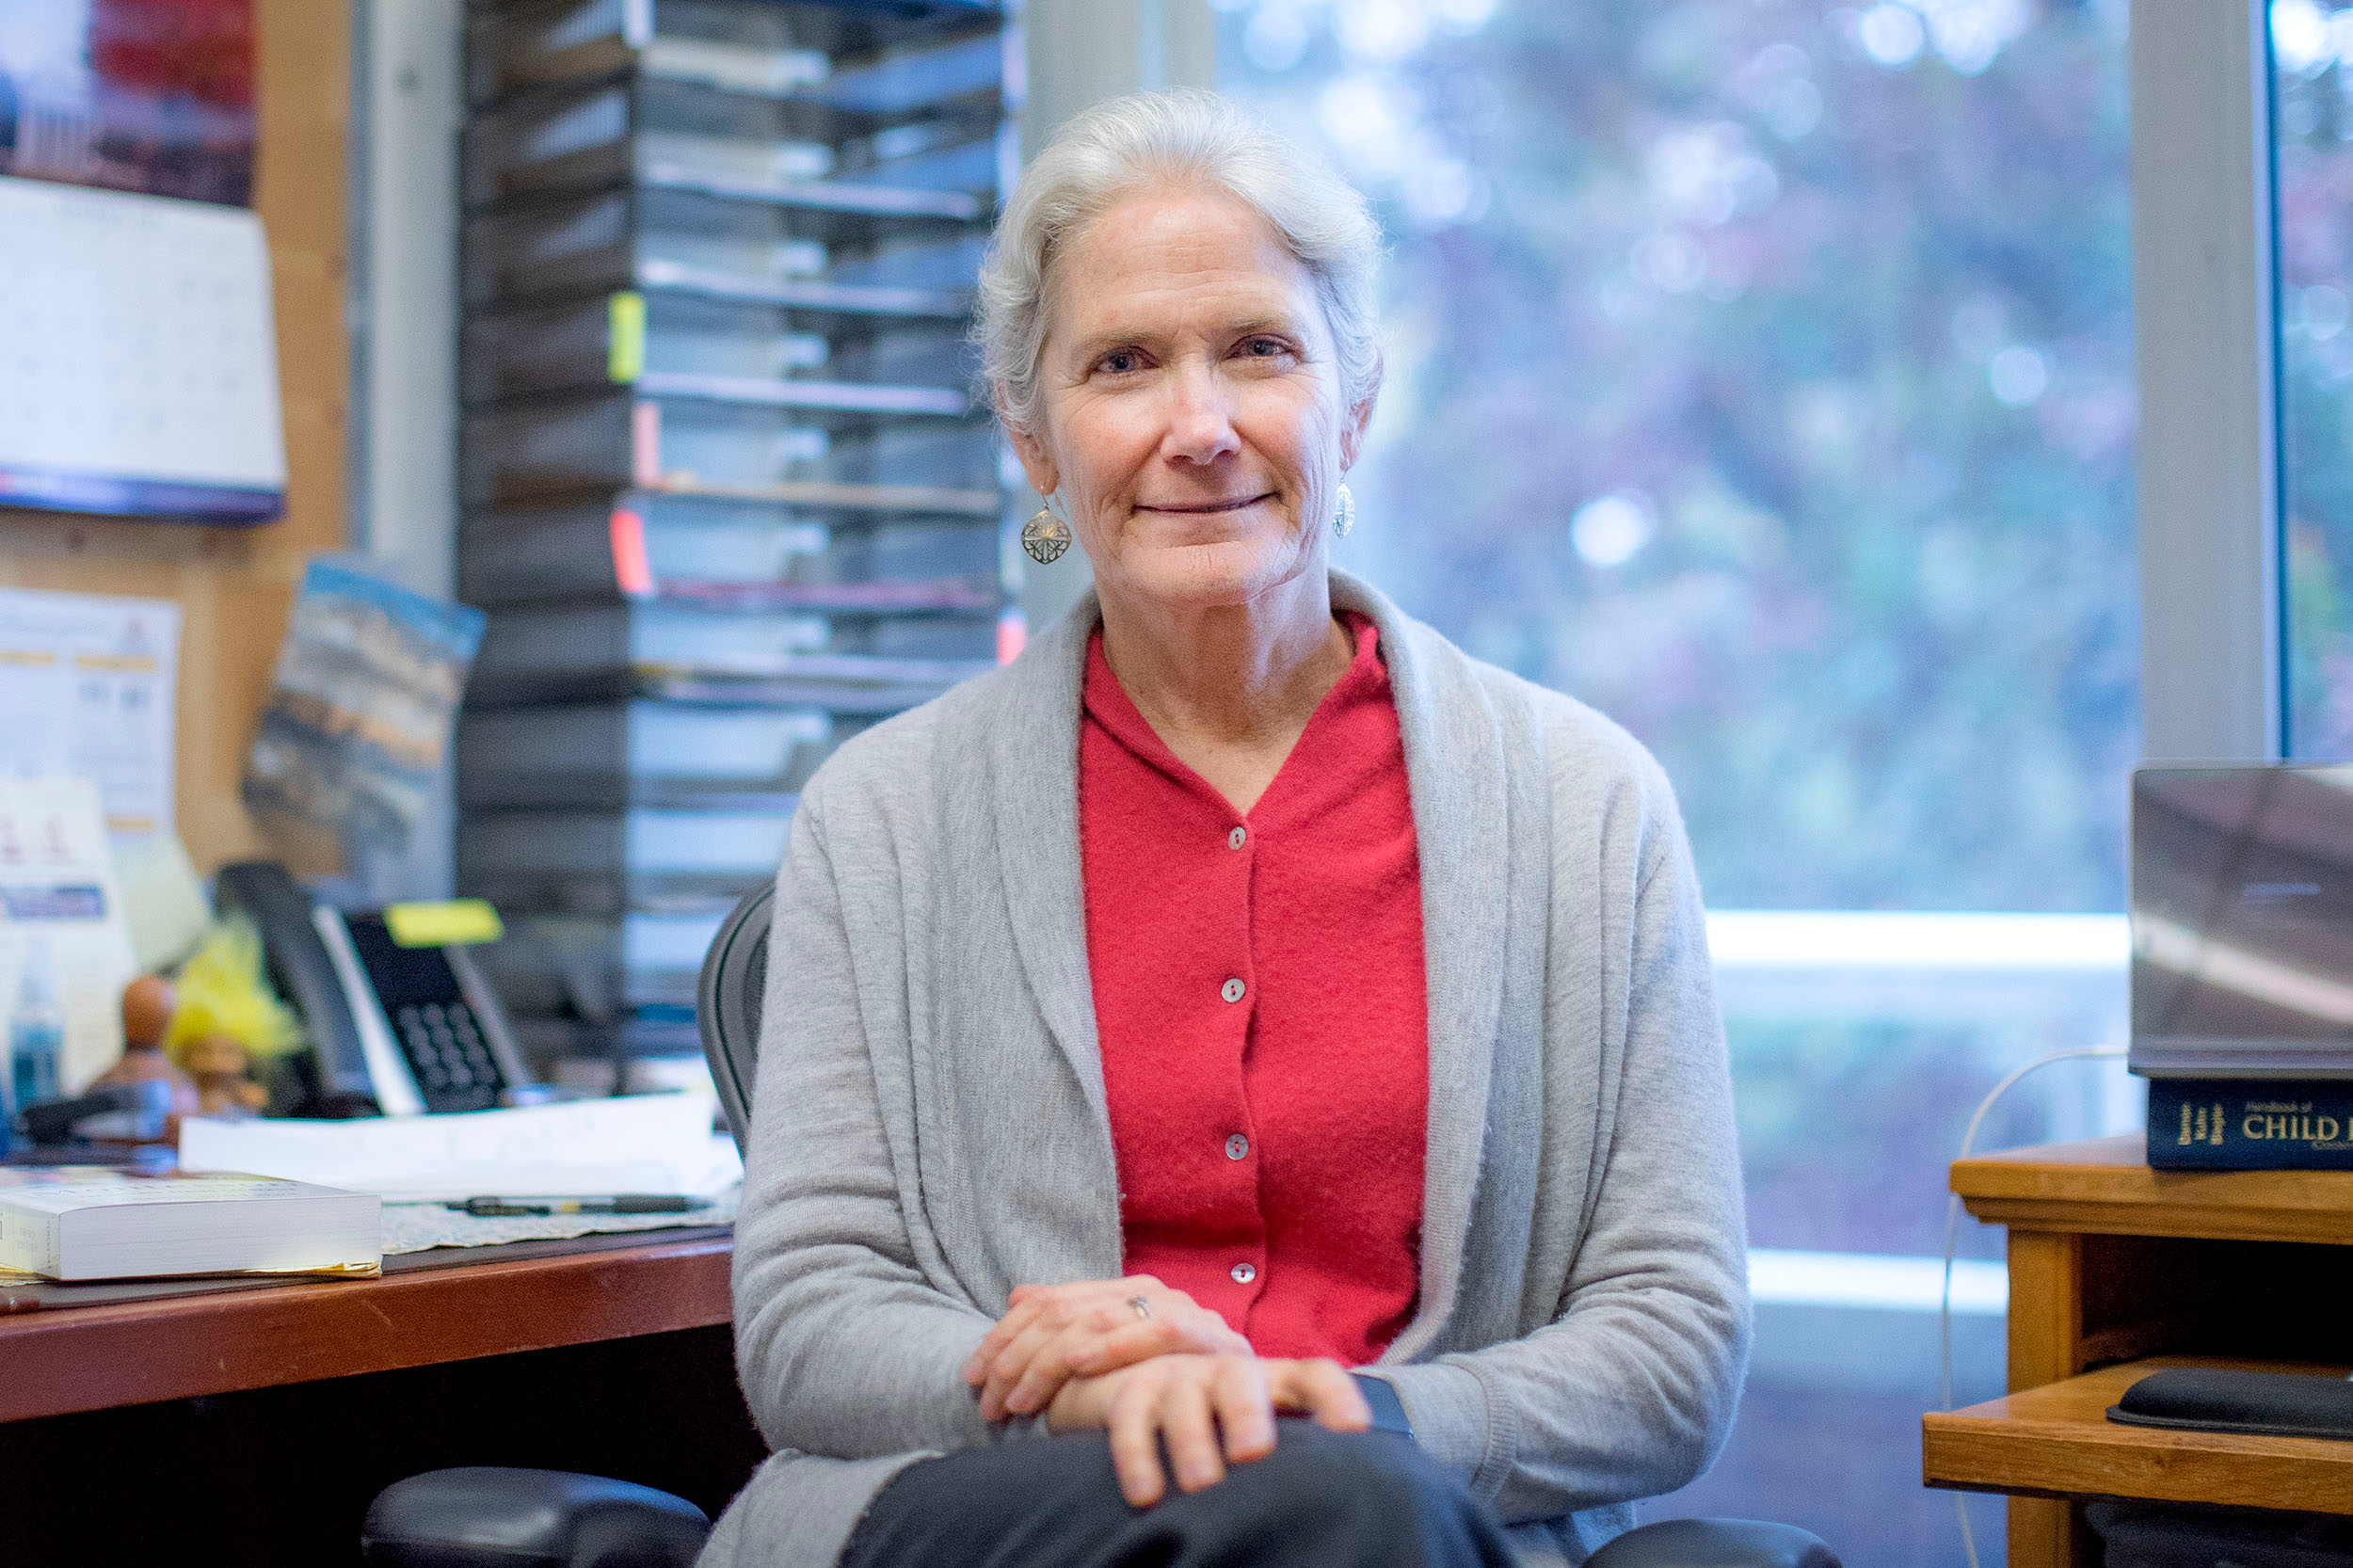 Psychology professor Angeline Lillard